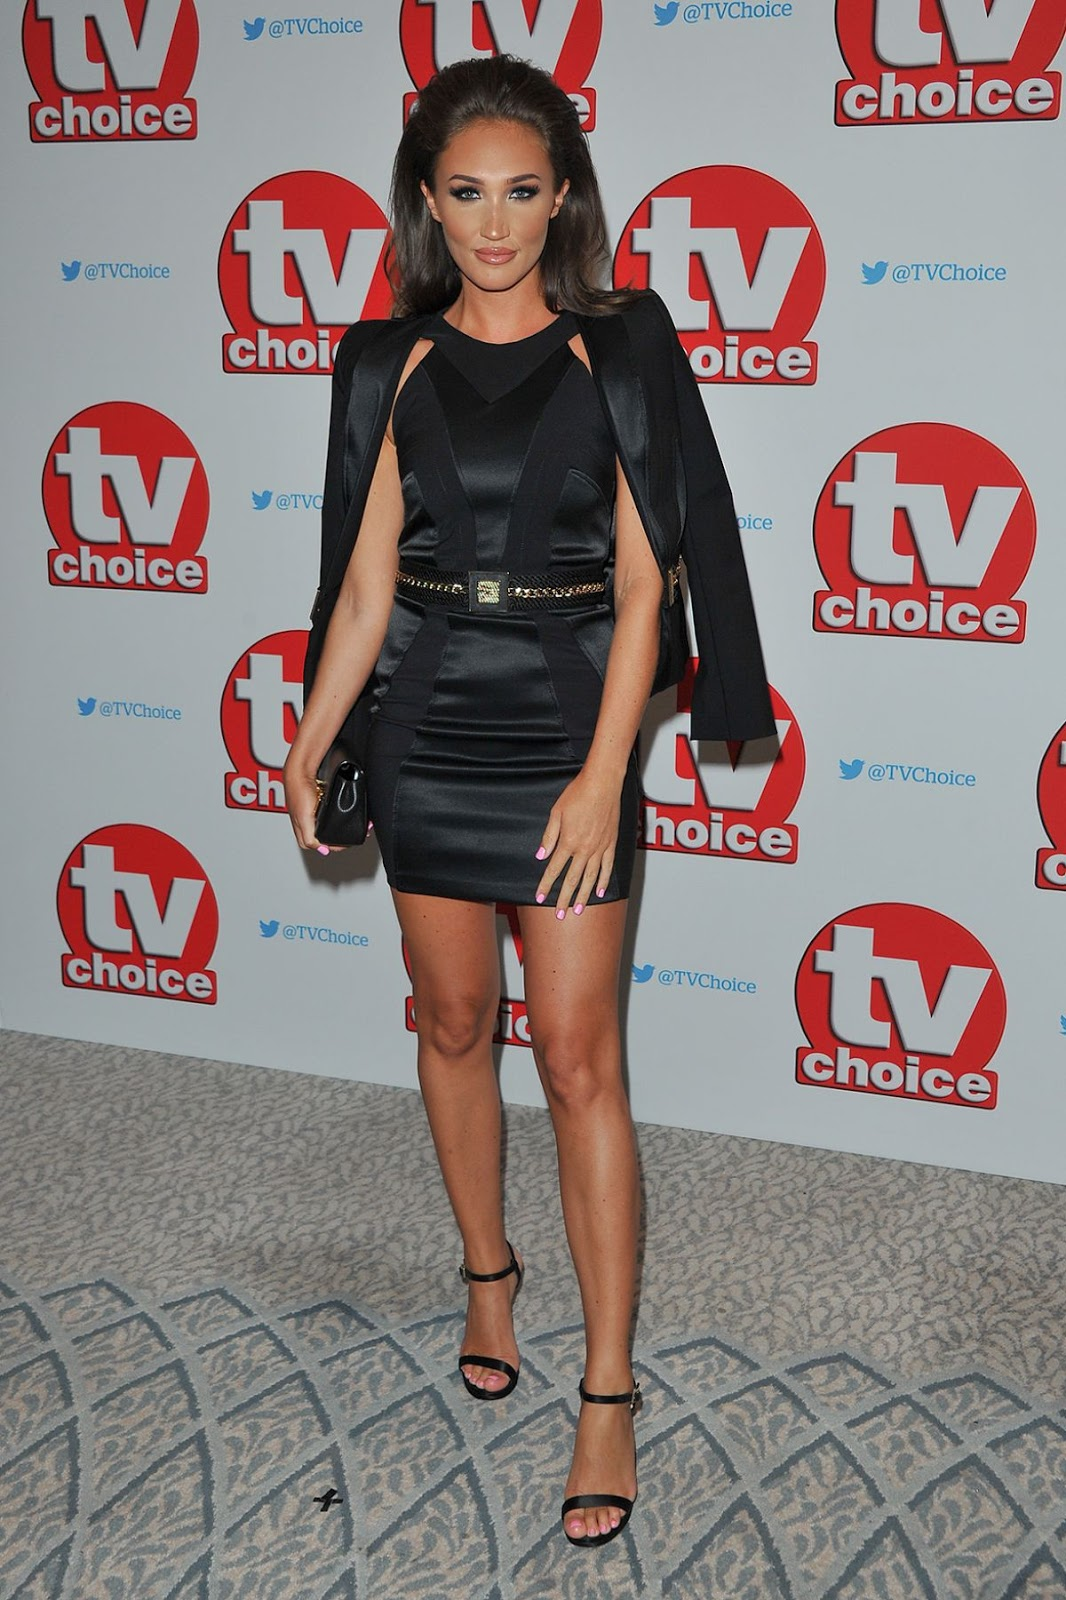 HD Photos of Megan Mckenna at TV Choice Awards in London